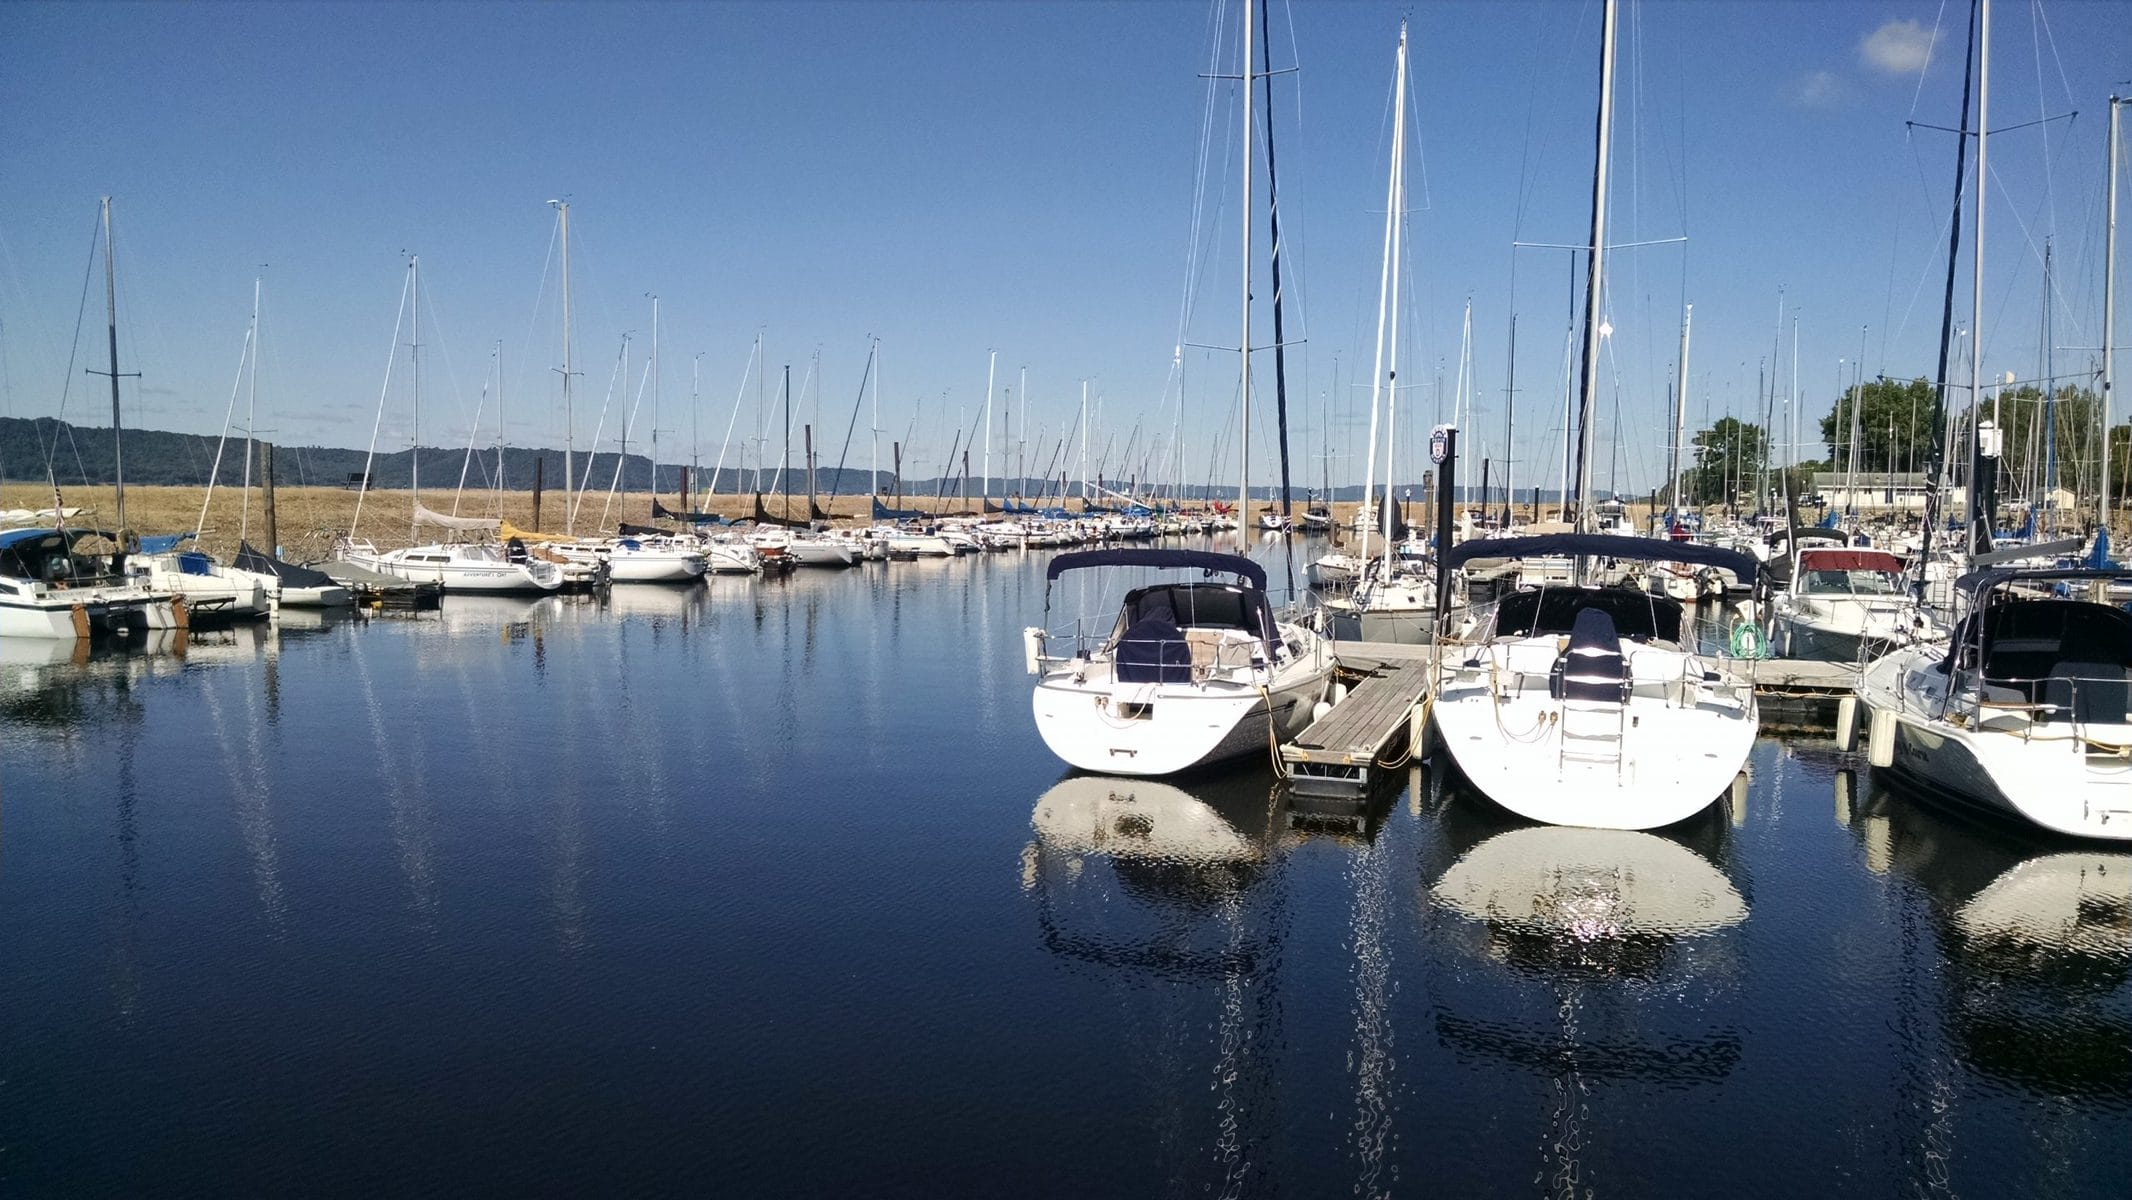 Pepin Sailing School & Charters